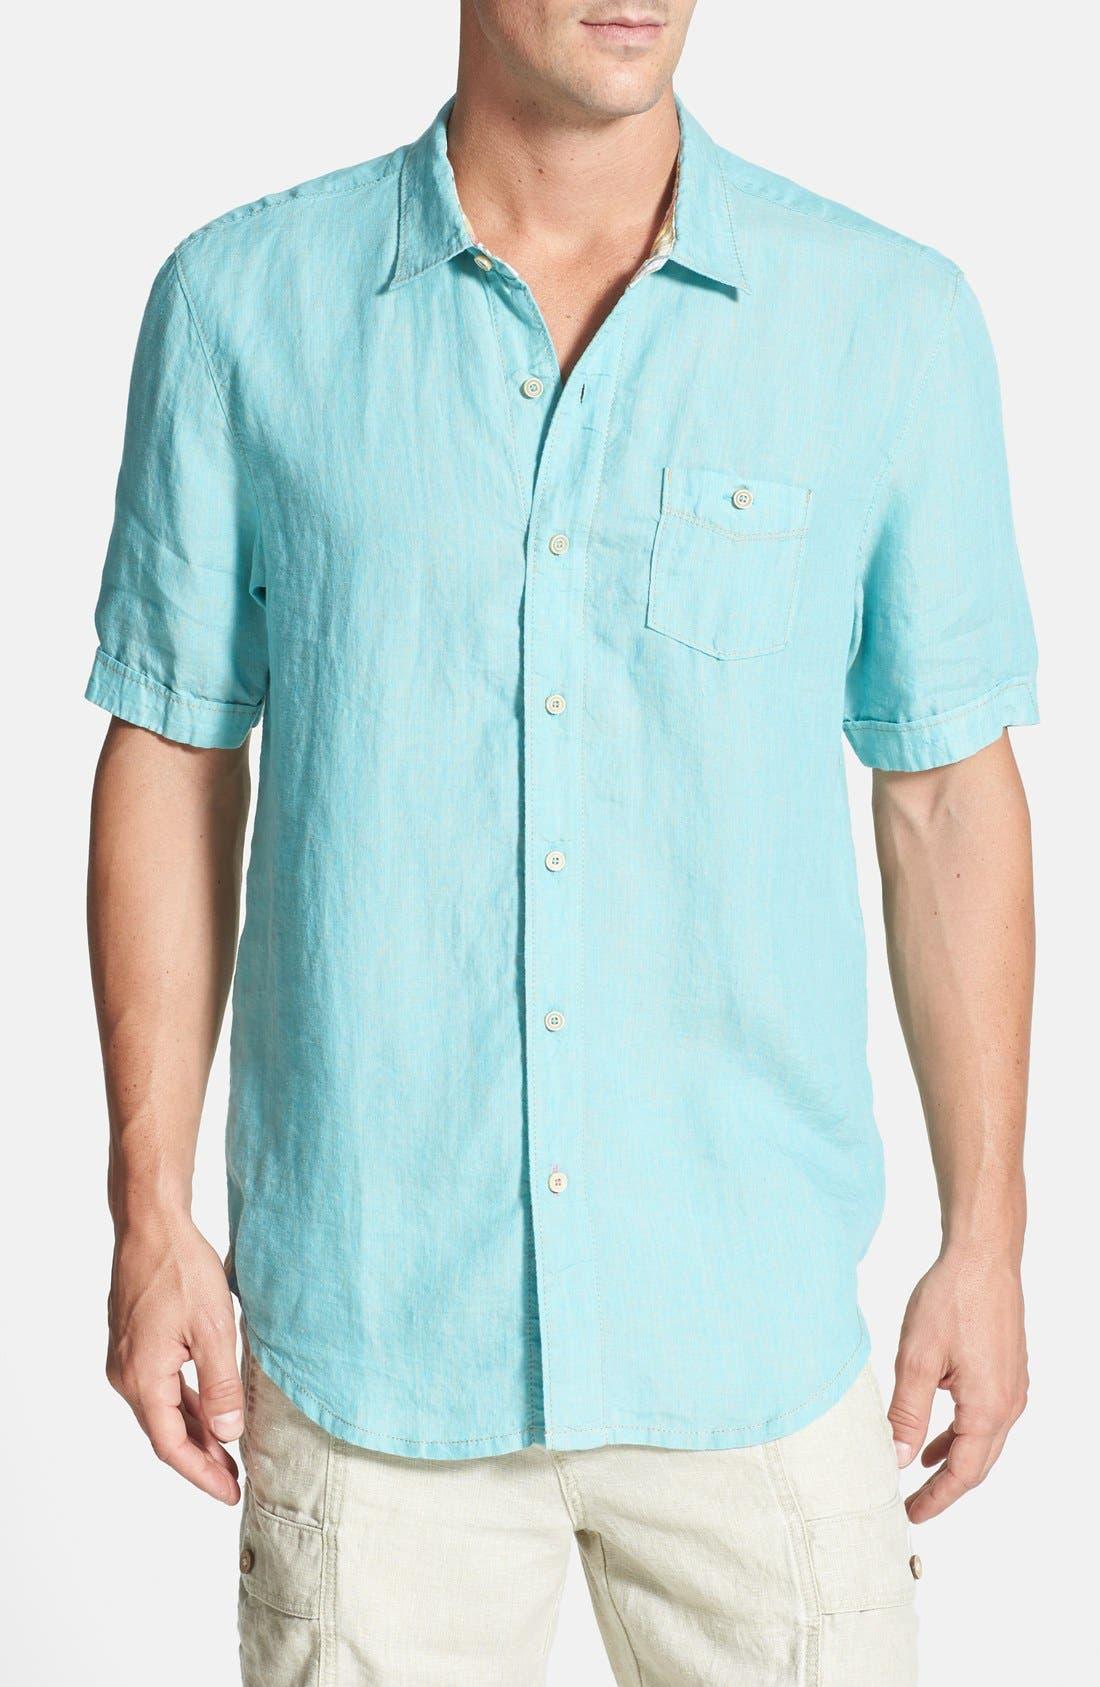 Main Image - Tommy Bahama 'Party Breezer' Short Sleeve Linen Sport Shirt